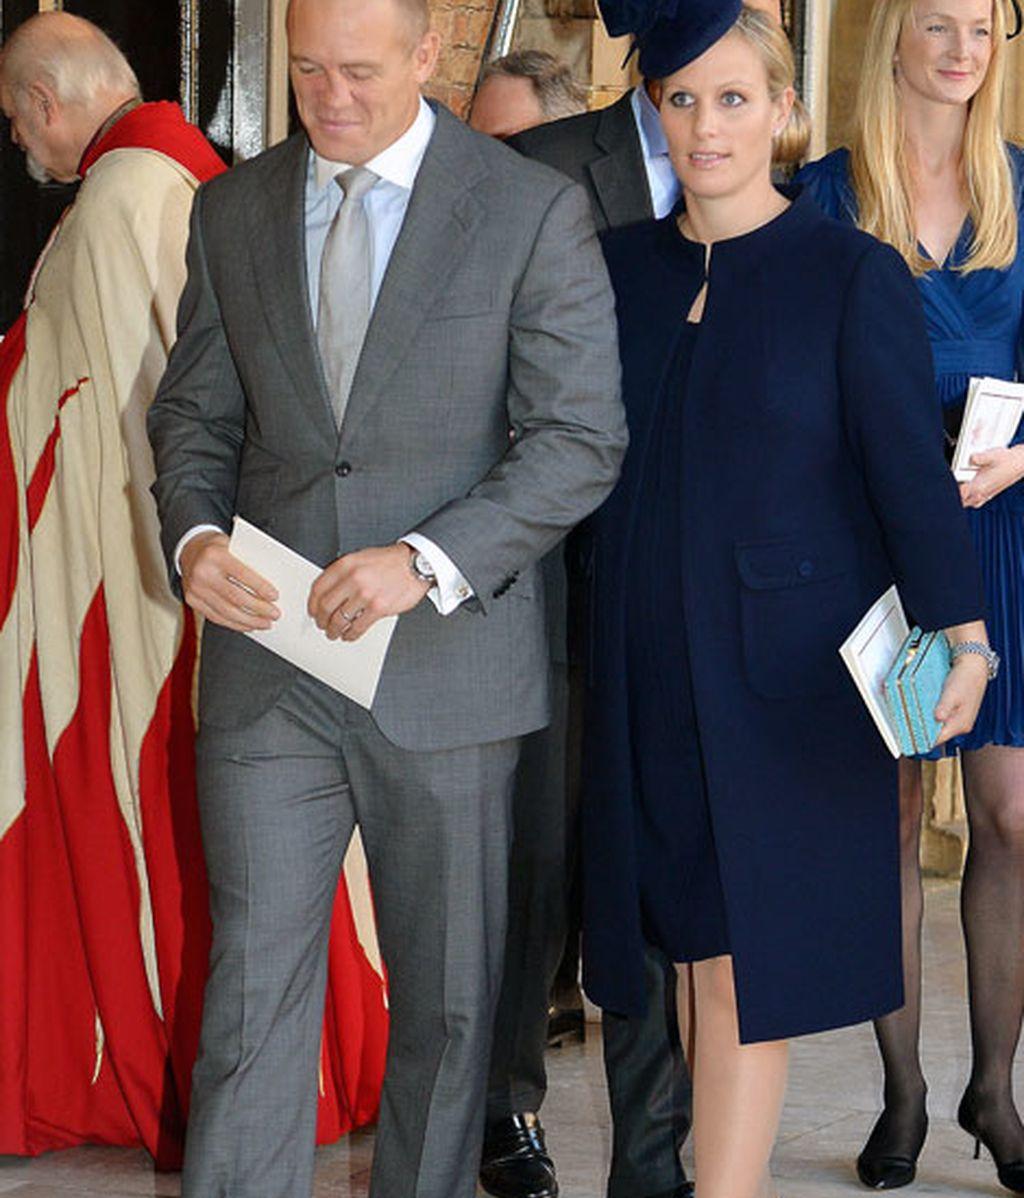 Zara Phillips, acompañada por su marido, Mike Tindall